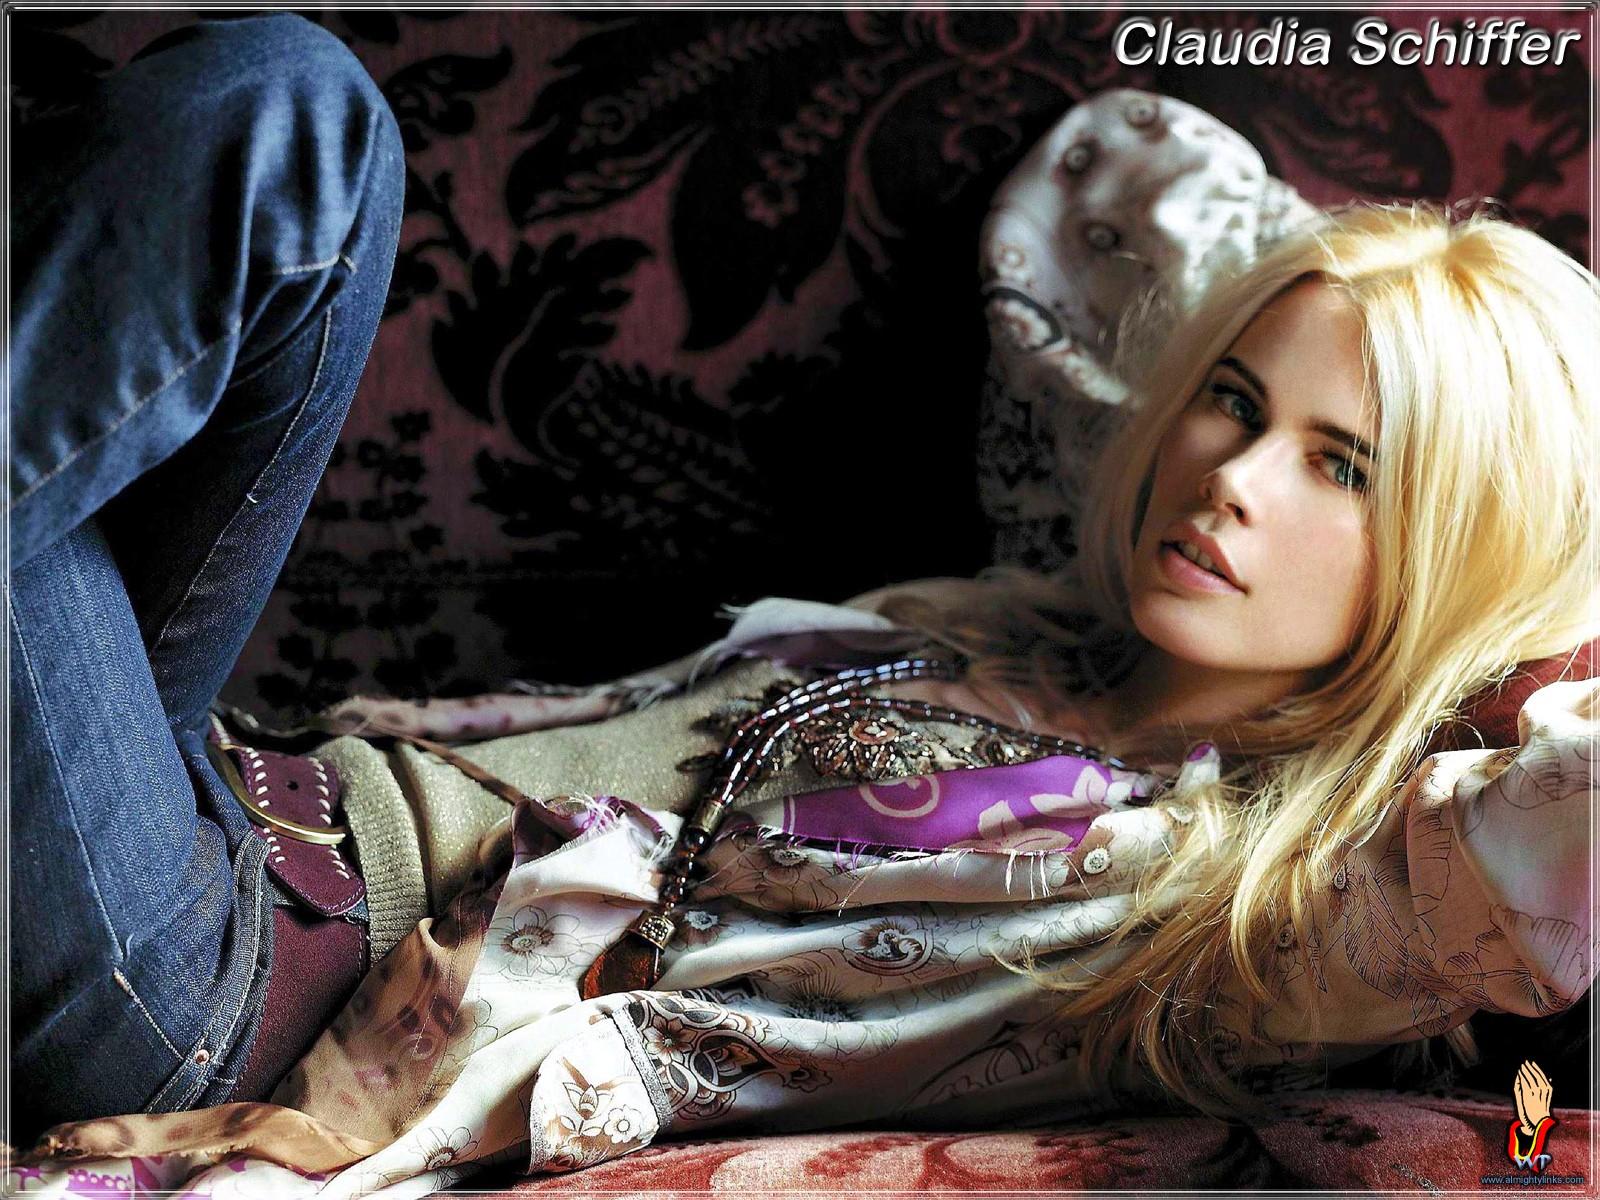 Claudia Schiffer Fondo de Pantalla and Fondo de Escritorio ... ecdfaf996741